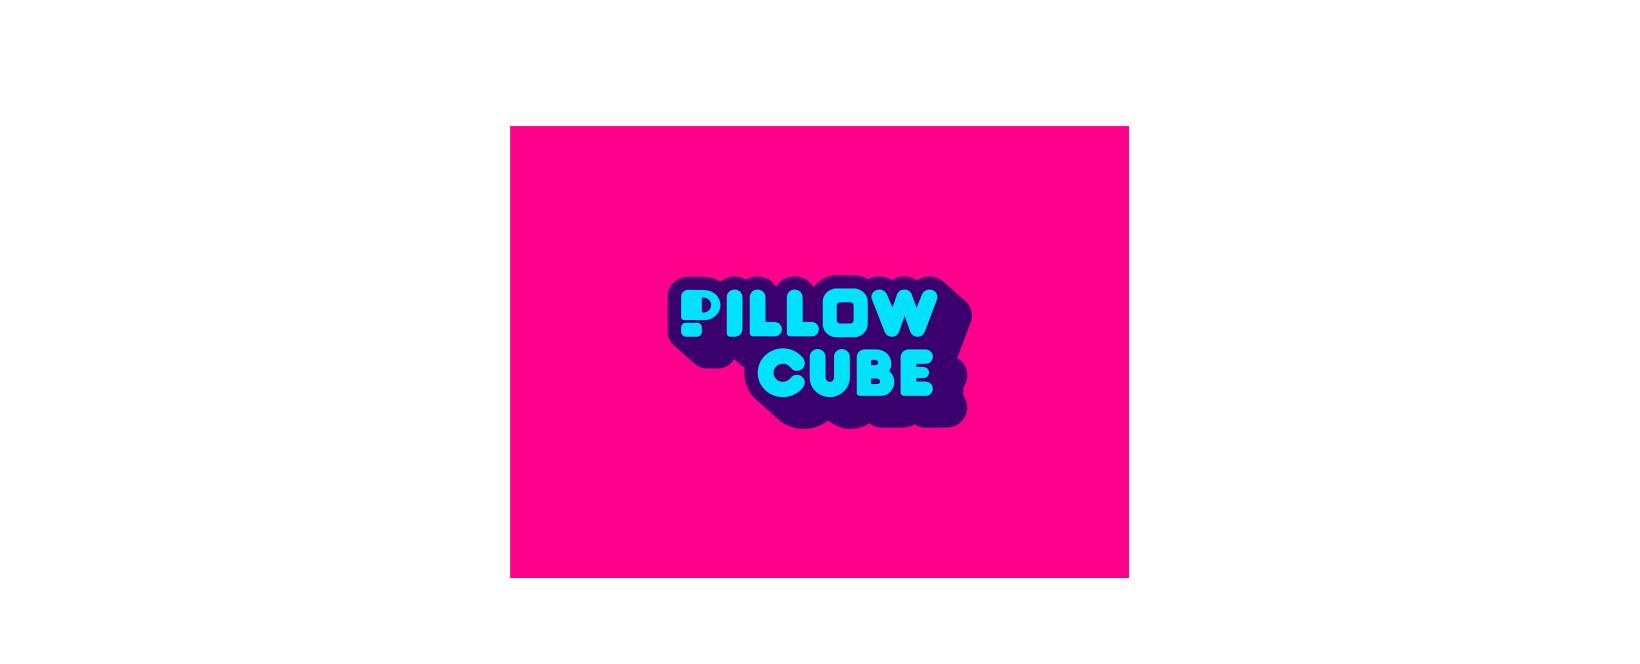 Pillow Cube Discount Code 2021